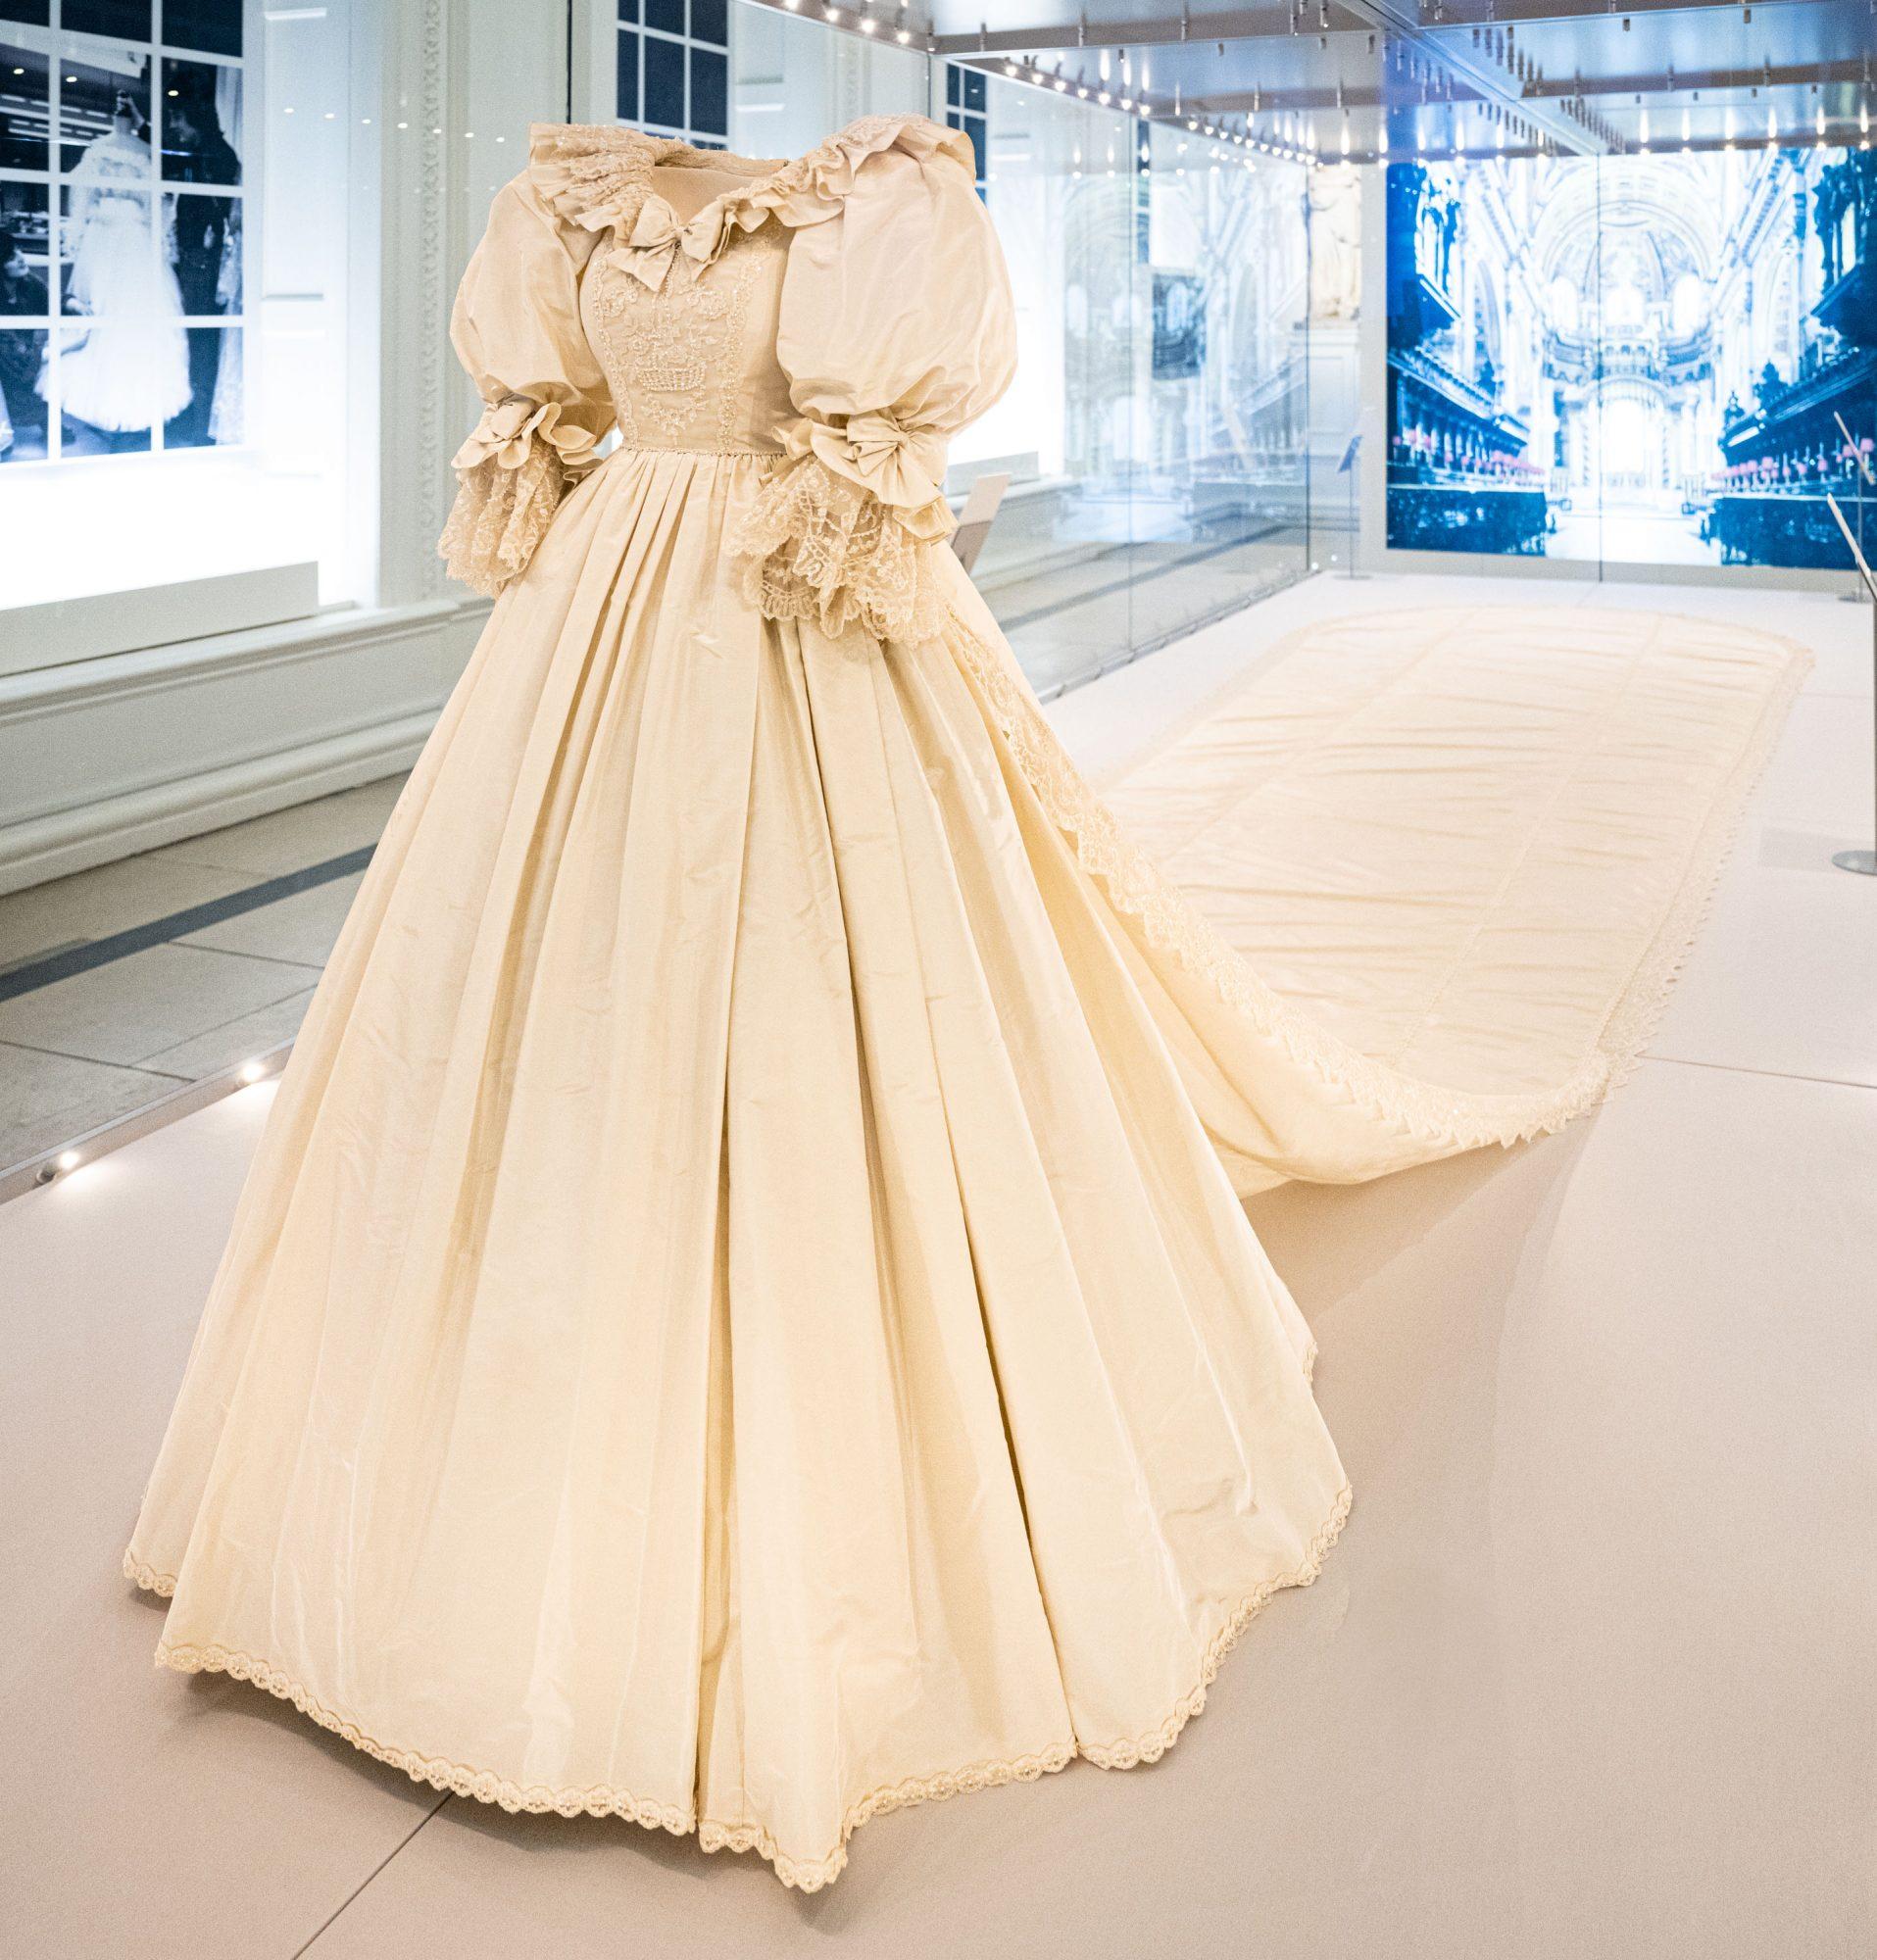 The wedding dress of Princess Diana